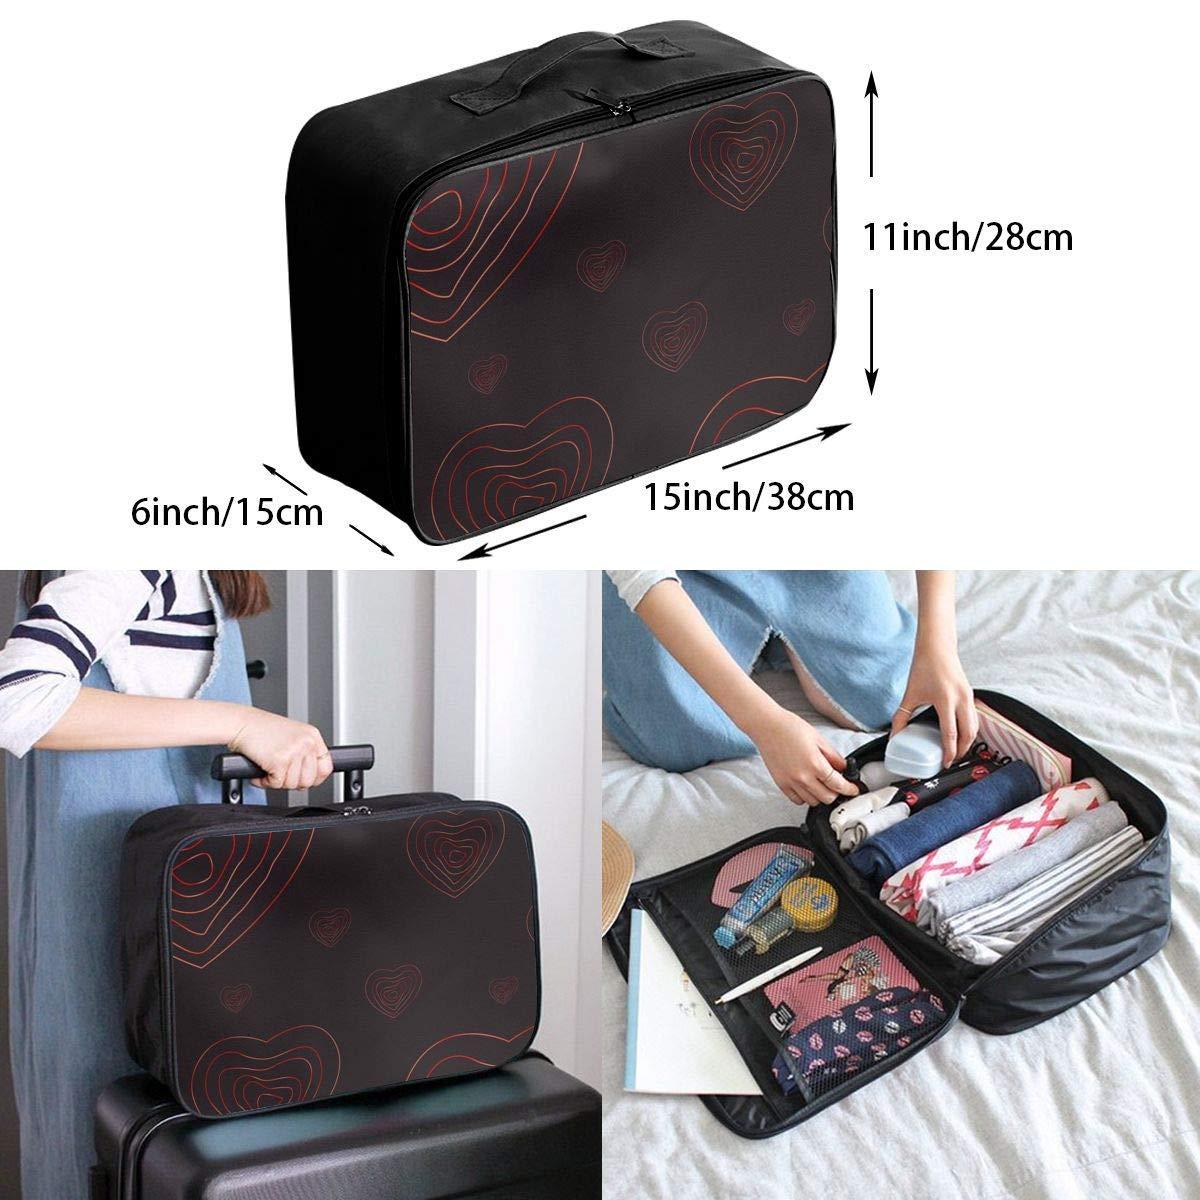 Love Heart Patterns JTRVW Luggage Bags for Travel Travel Duffel Bag Waterproof Fashion Lightweight Large Capacity Portable Duffel Bag for Men /& Women